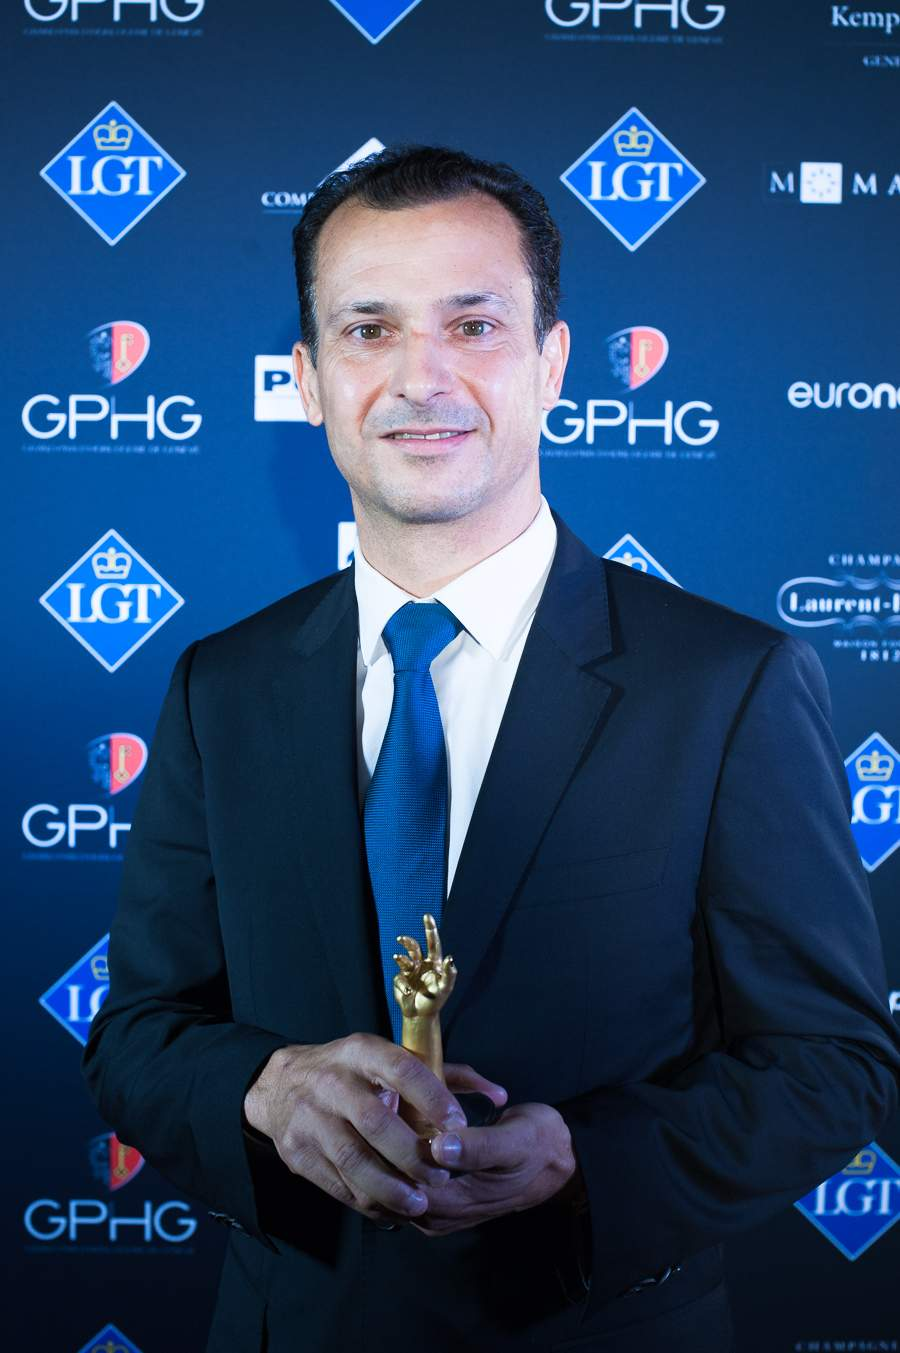 Eric de Rocquigny, Directeur International Operations & Métiers of Van Cleef & Arpels, winner of the Jewellery Watch Prize 2018 and the Women's Complication Watch Prize 2018